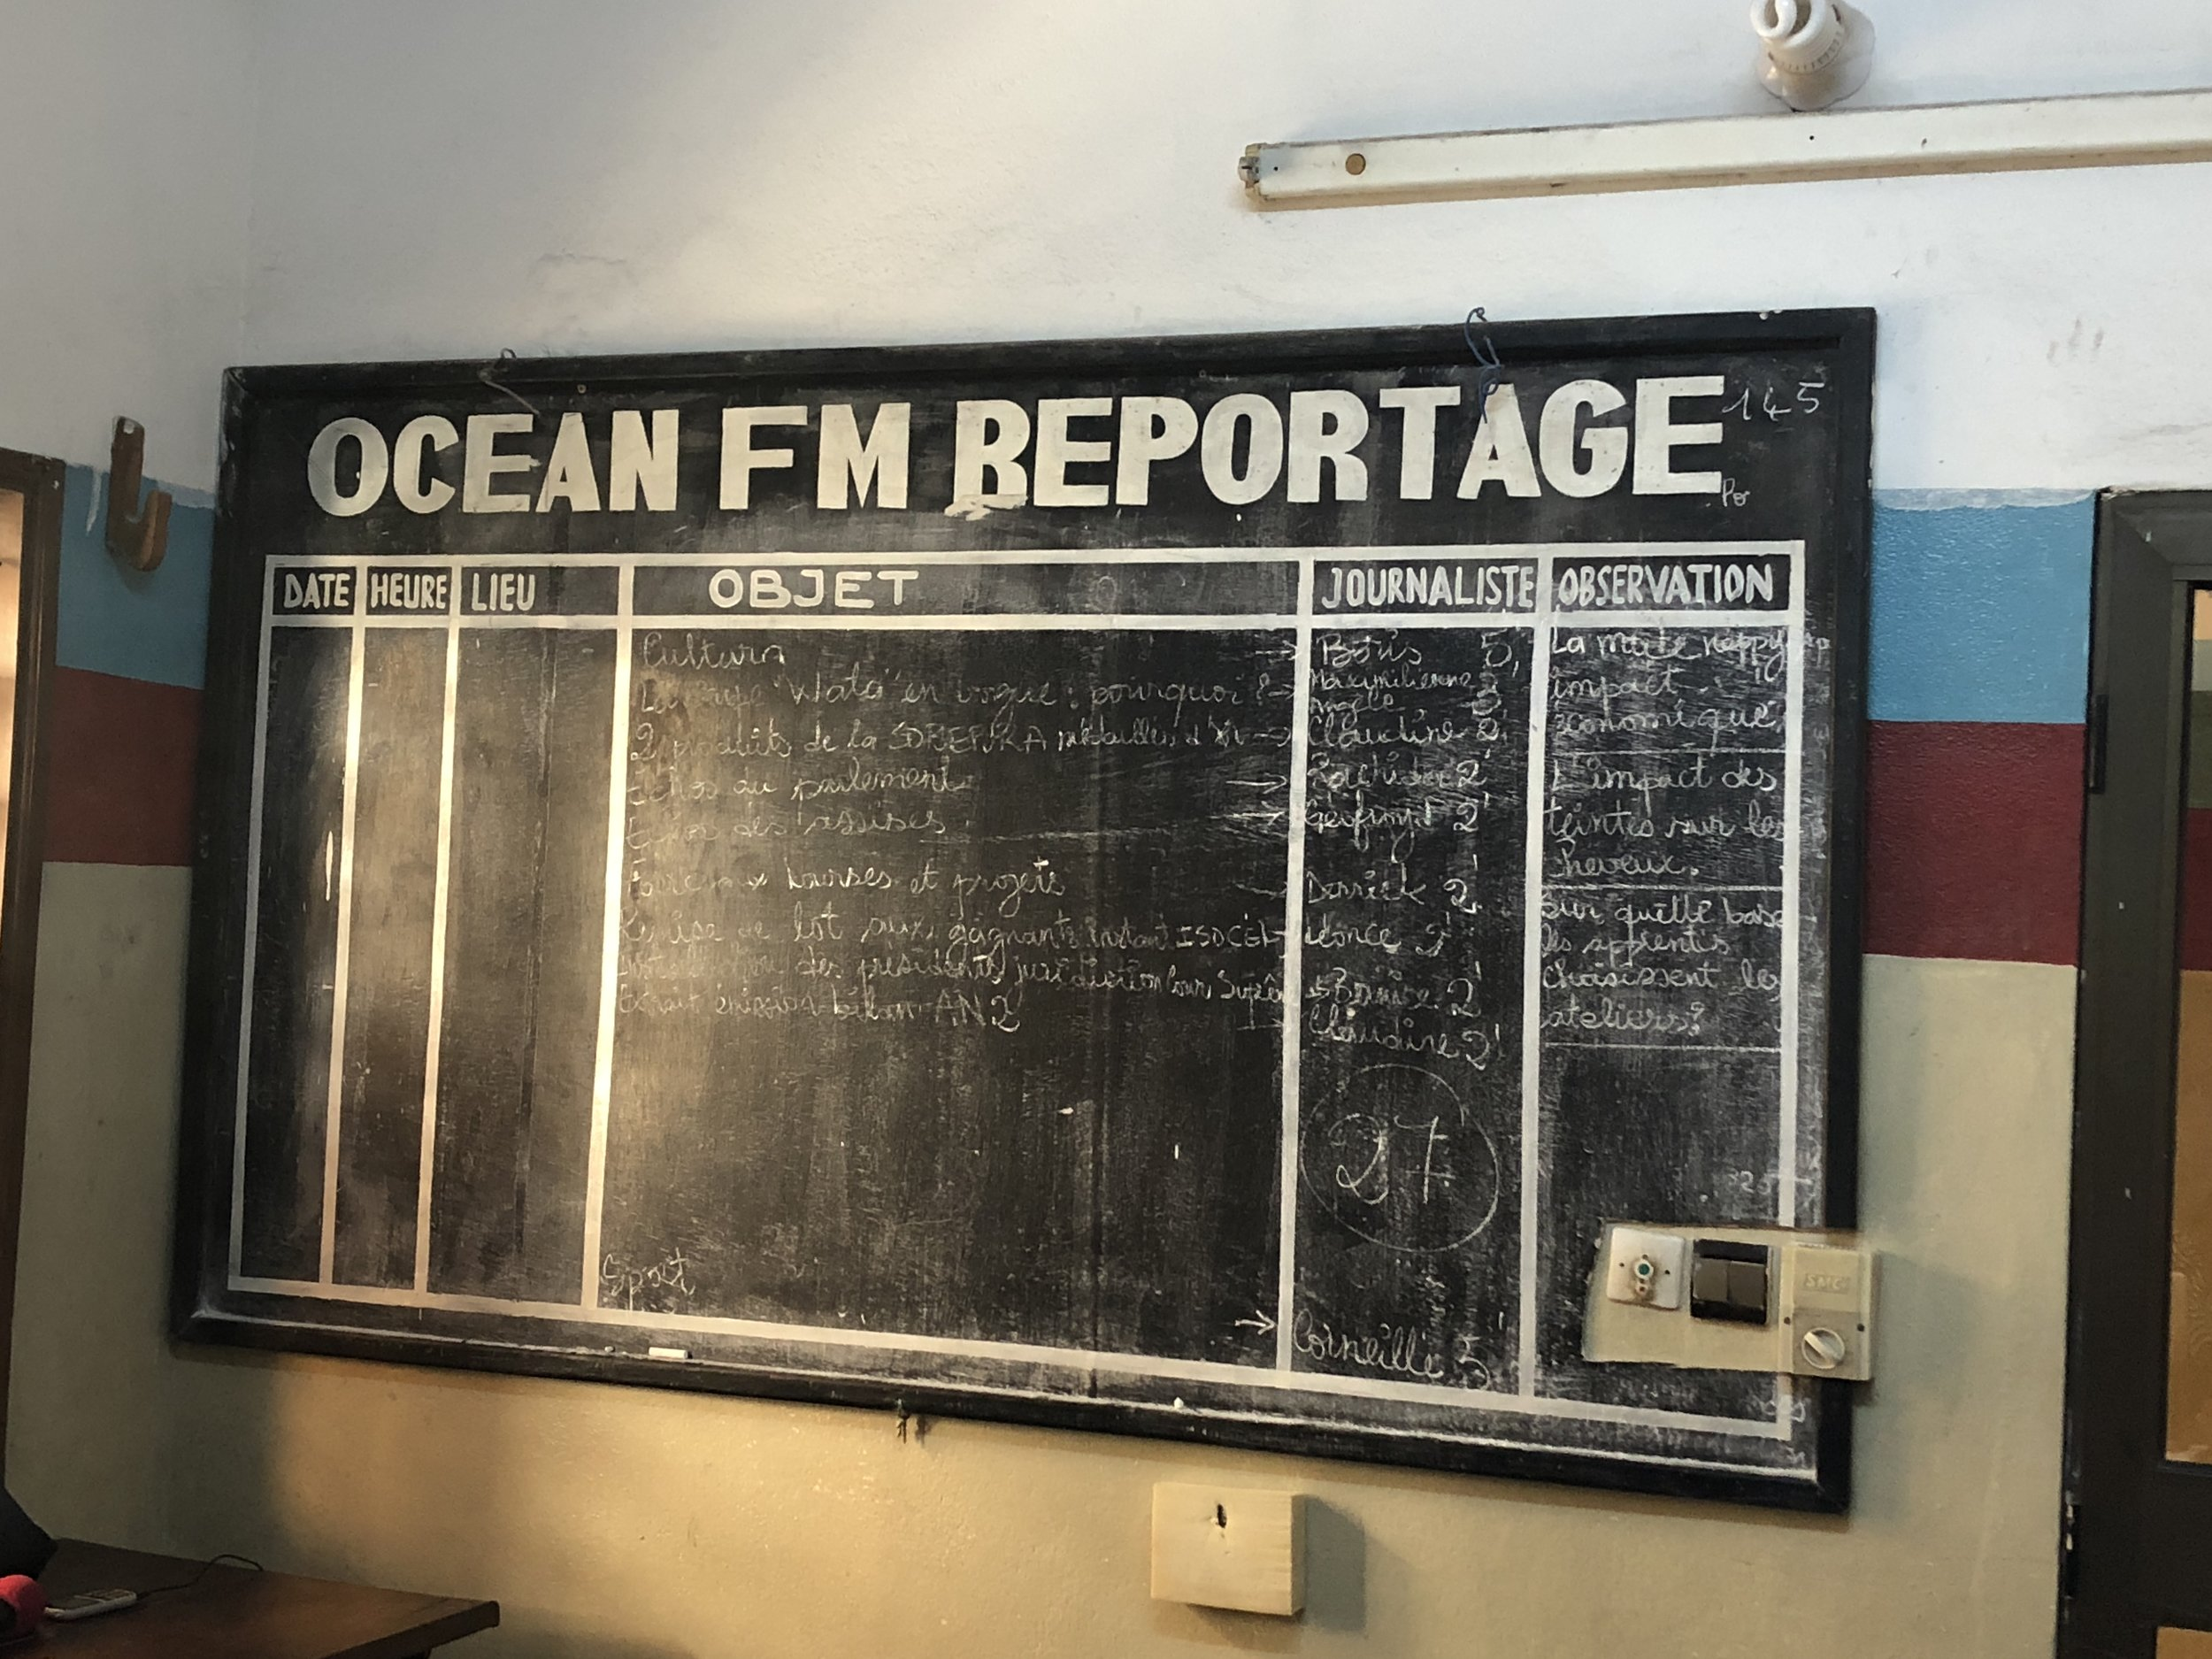 I do love an organized assignment board!